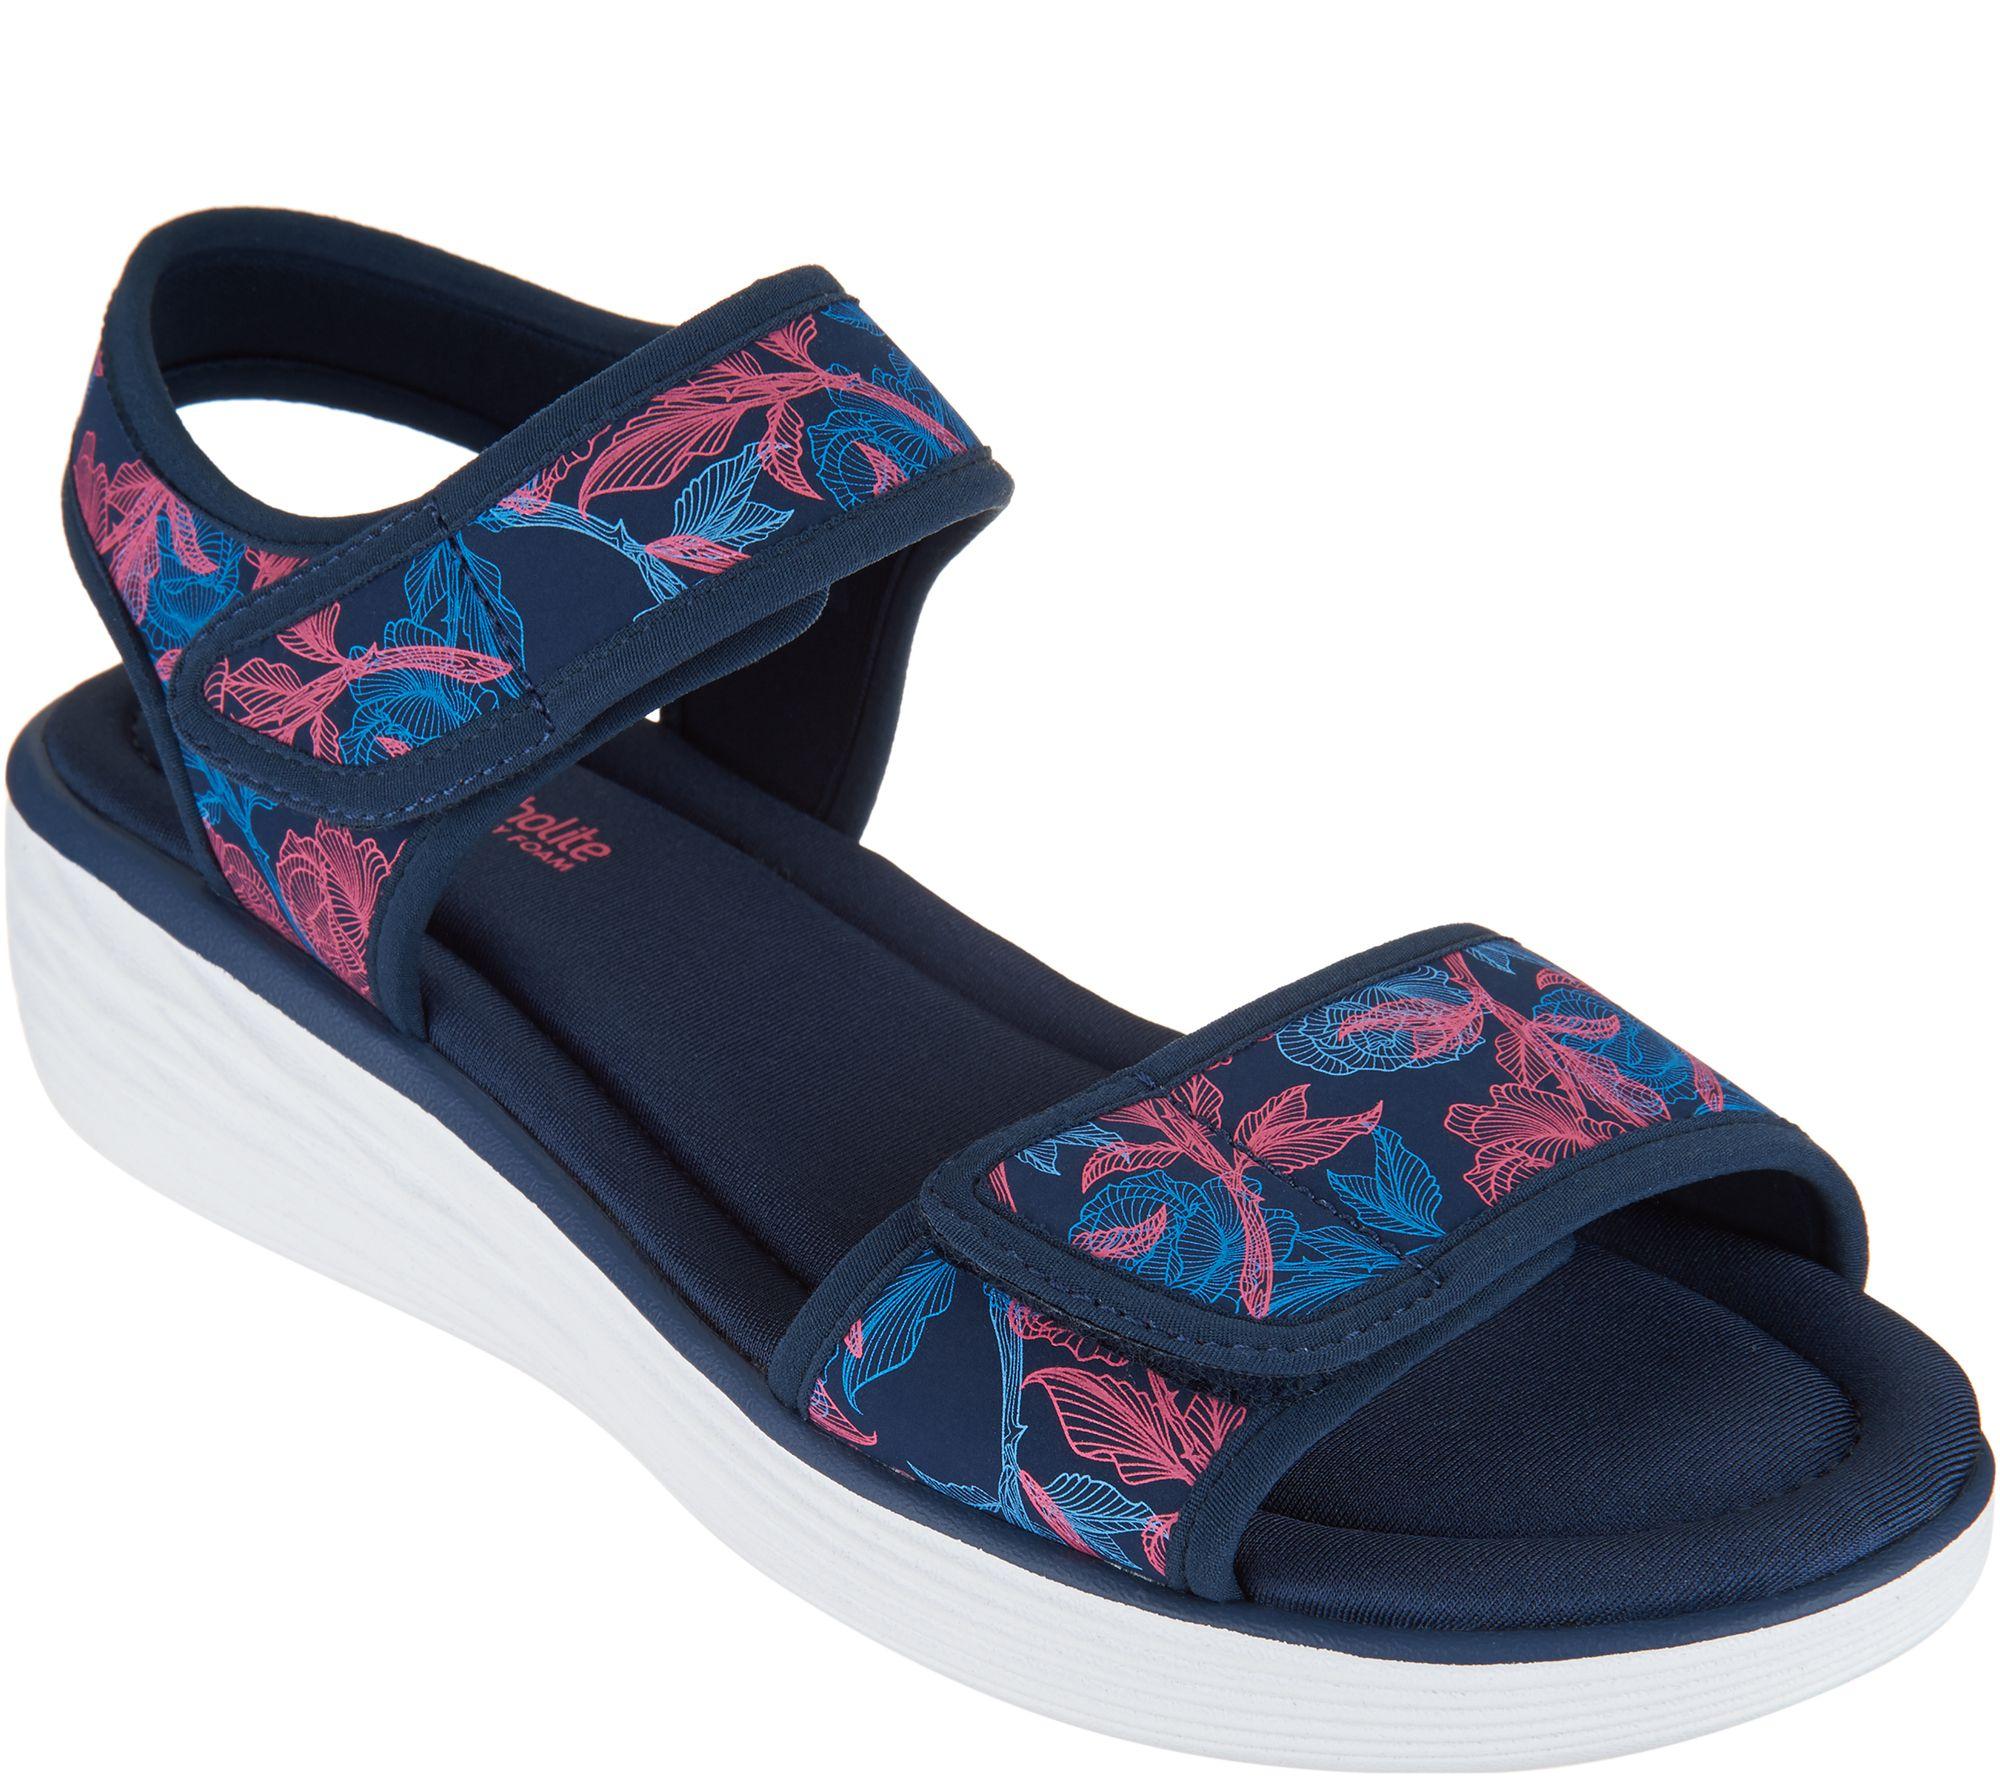 Ryka sandals shoes - Ryka Neoprene Wedge Sport Sandals Nora A292549